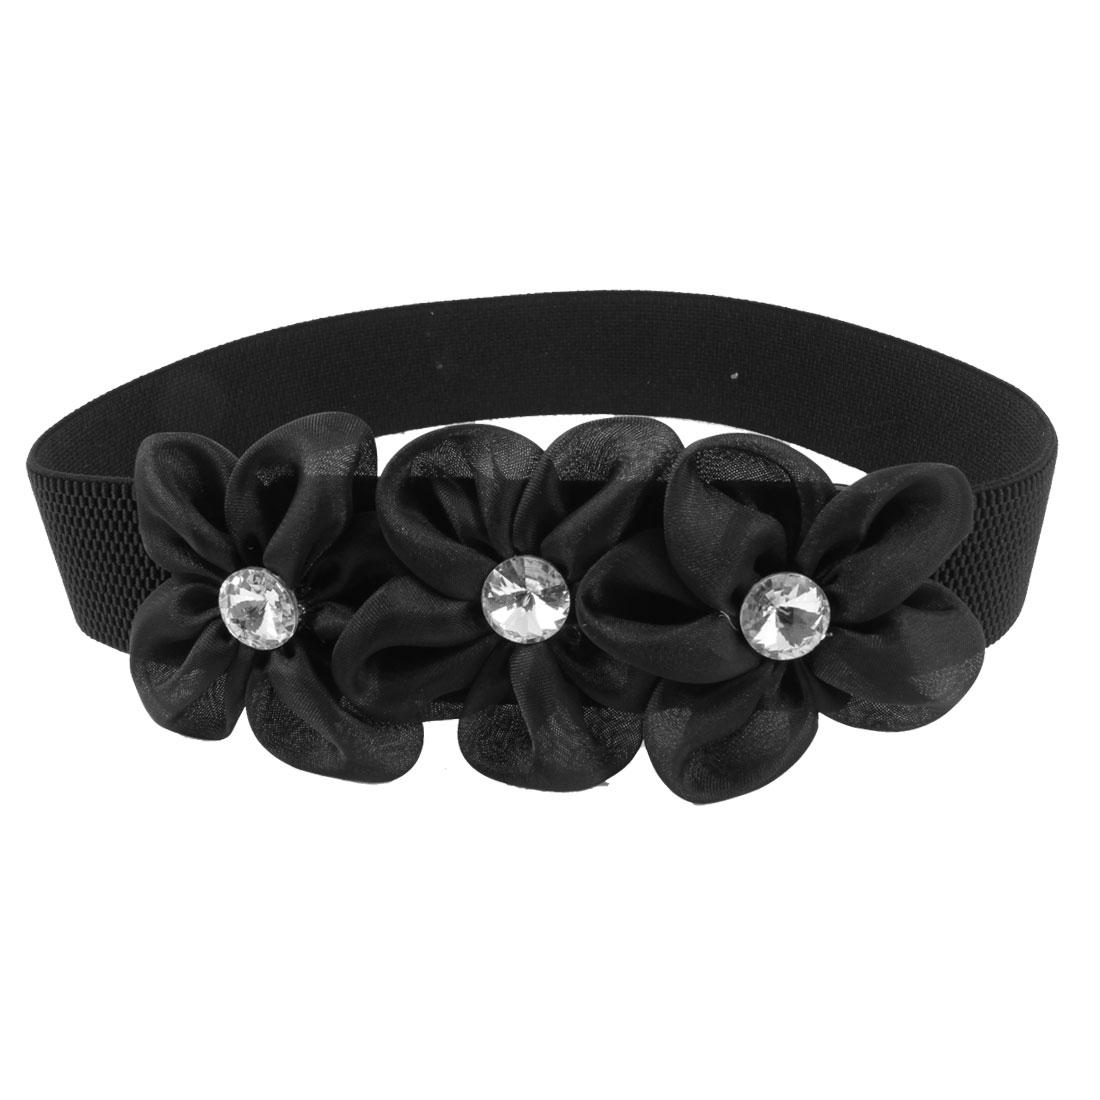 Lady Faceted Crystal Inlaid Black Organza Flower Decor Elastic Waist Band Belt